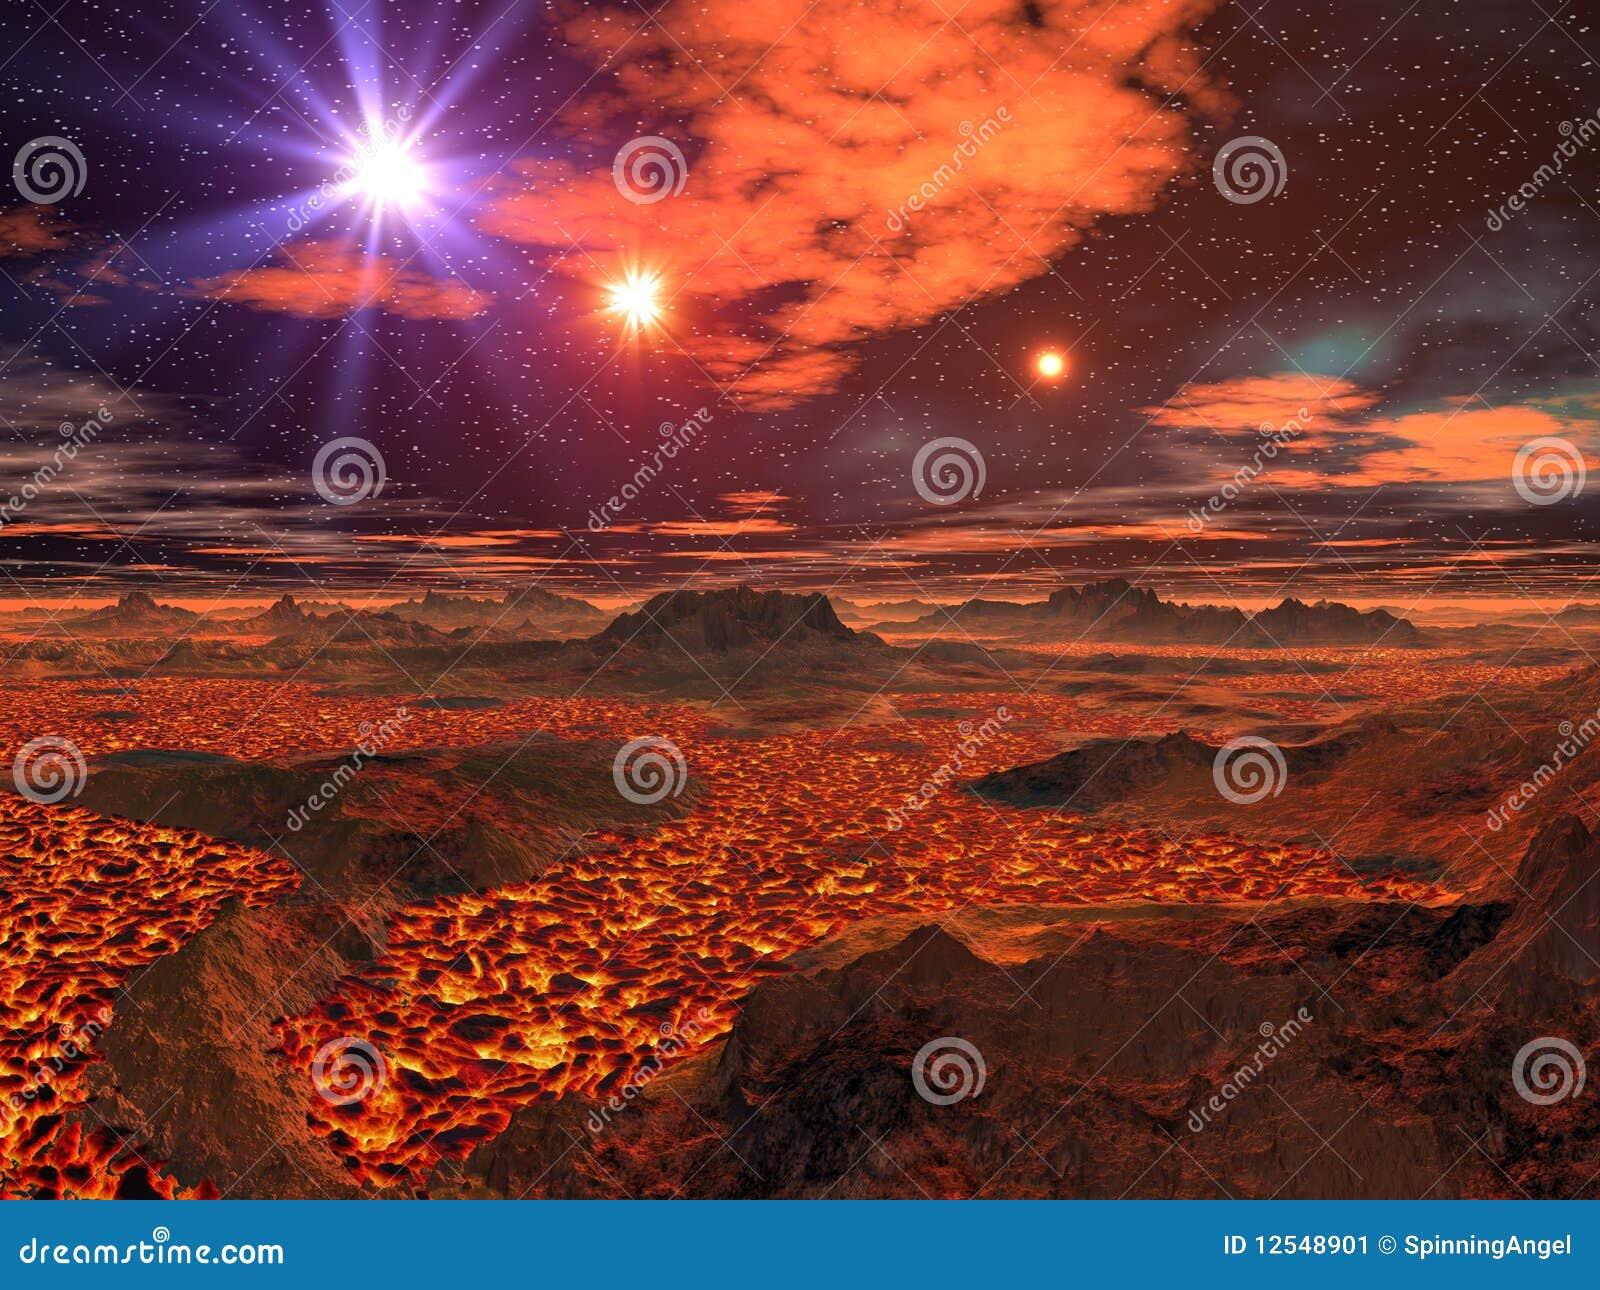 Alien море планеты лавы